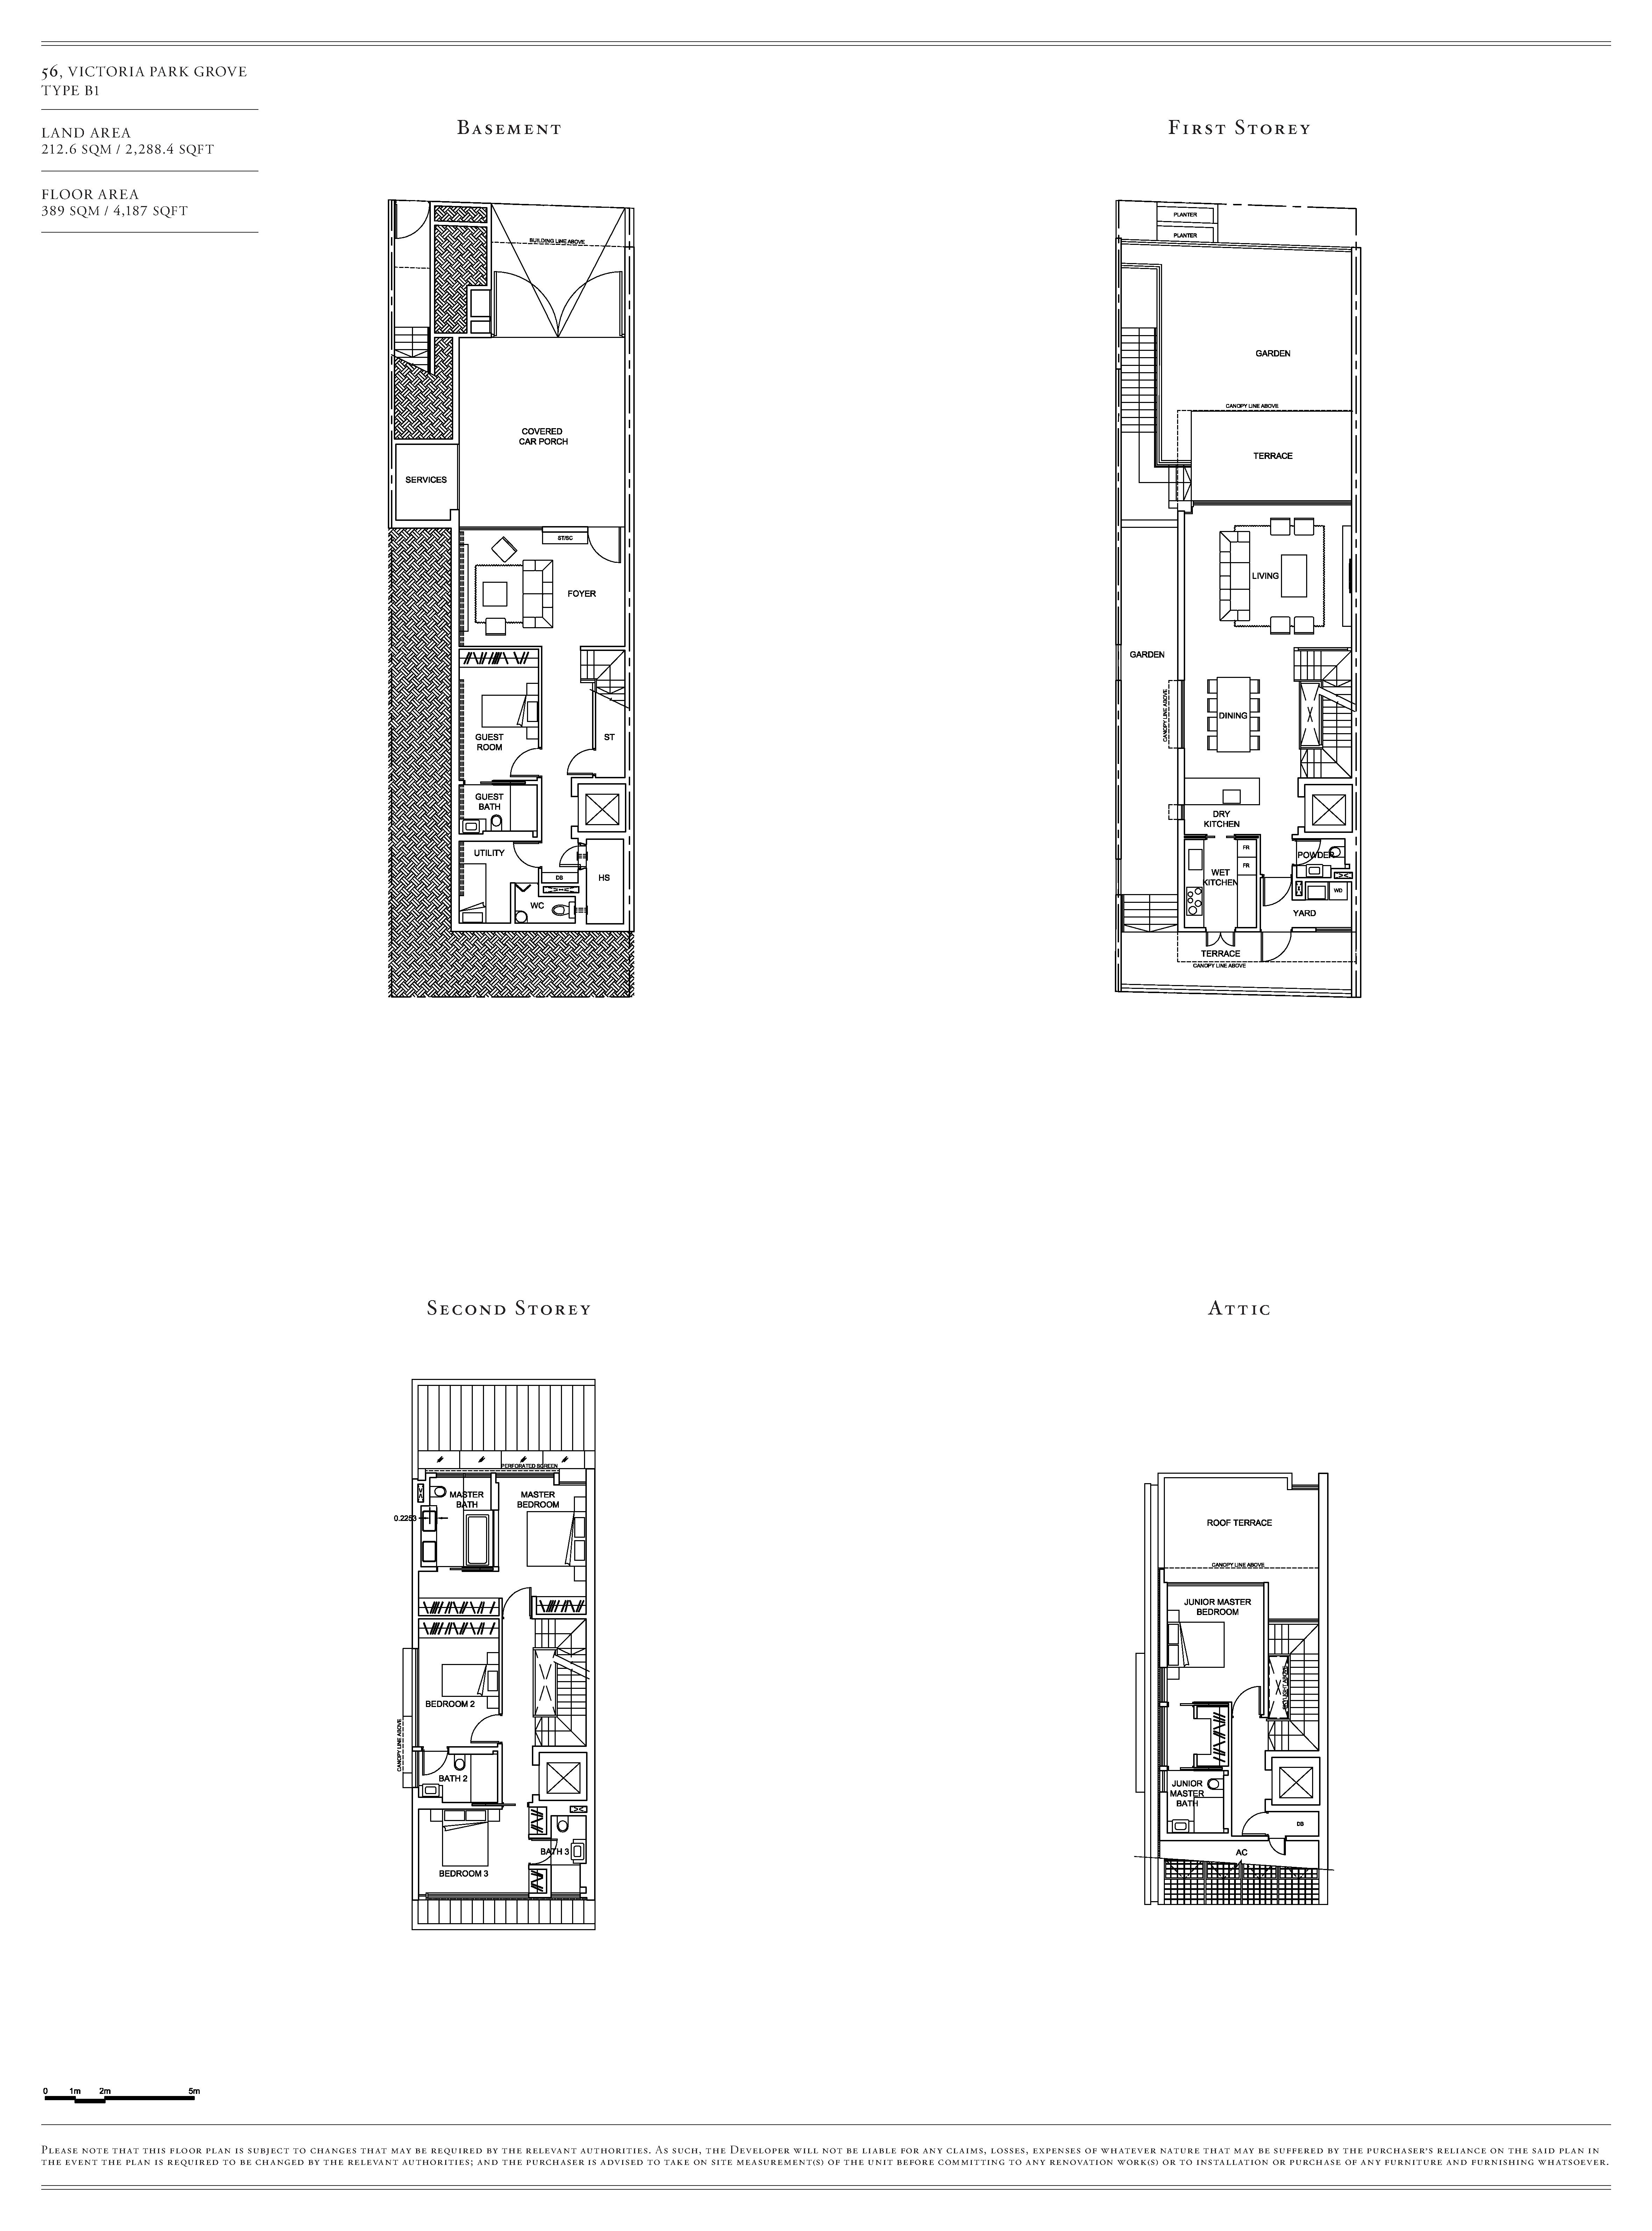 Victoria Park Villas House 56 Type B1 Floor Plans